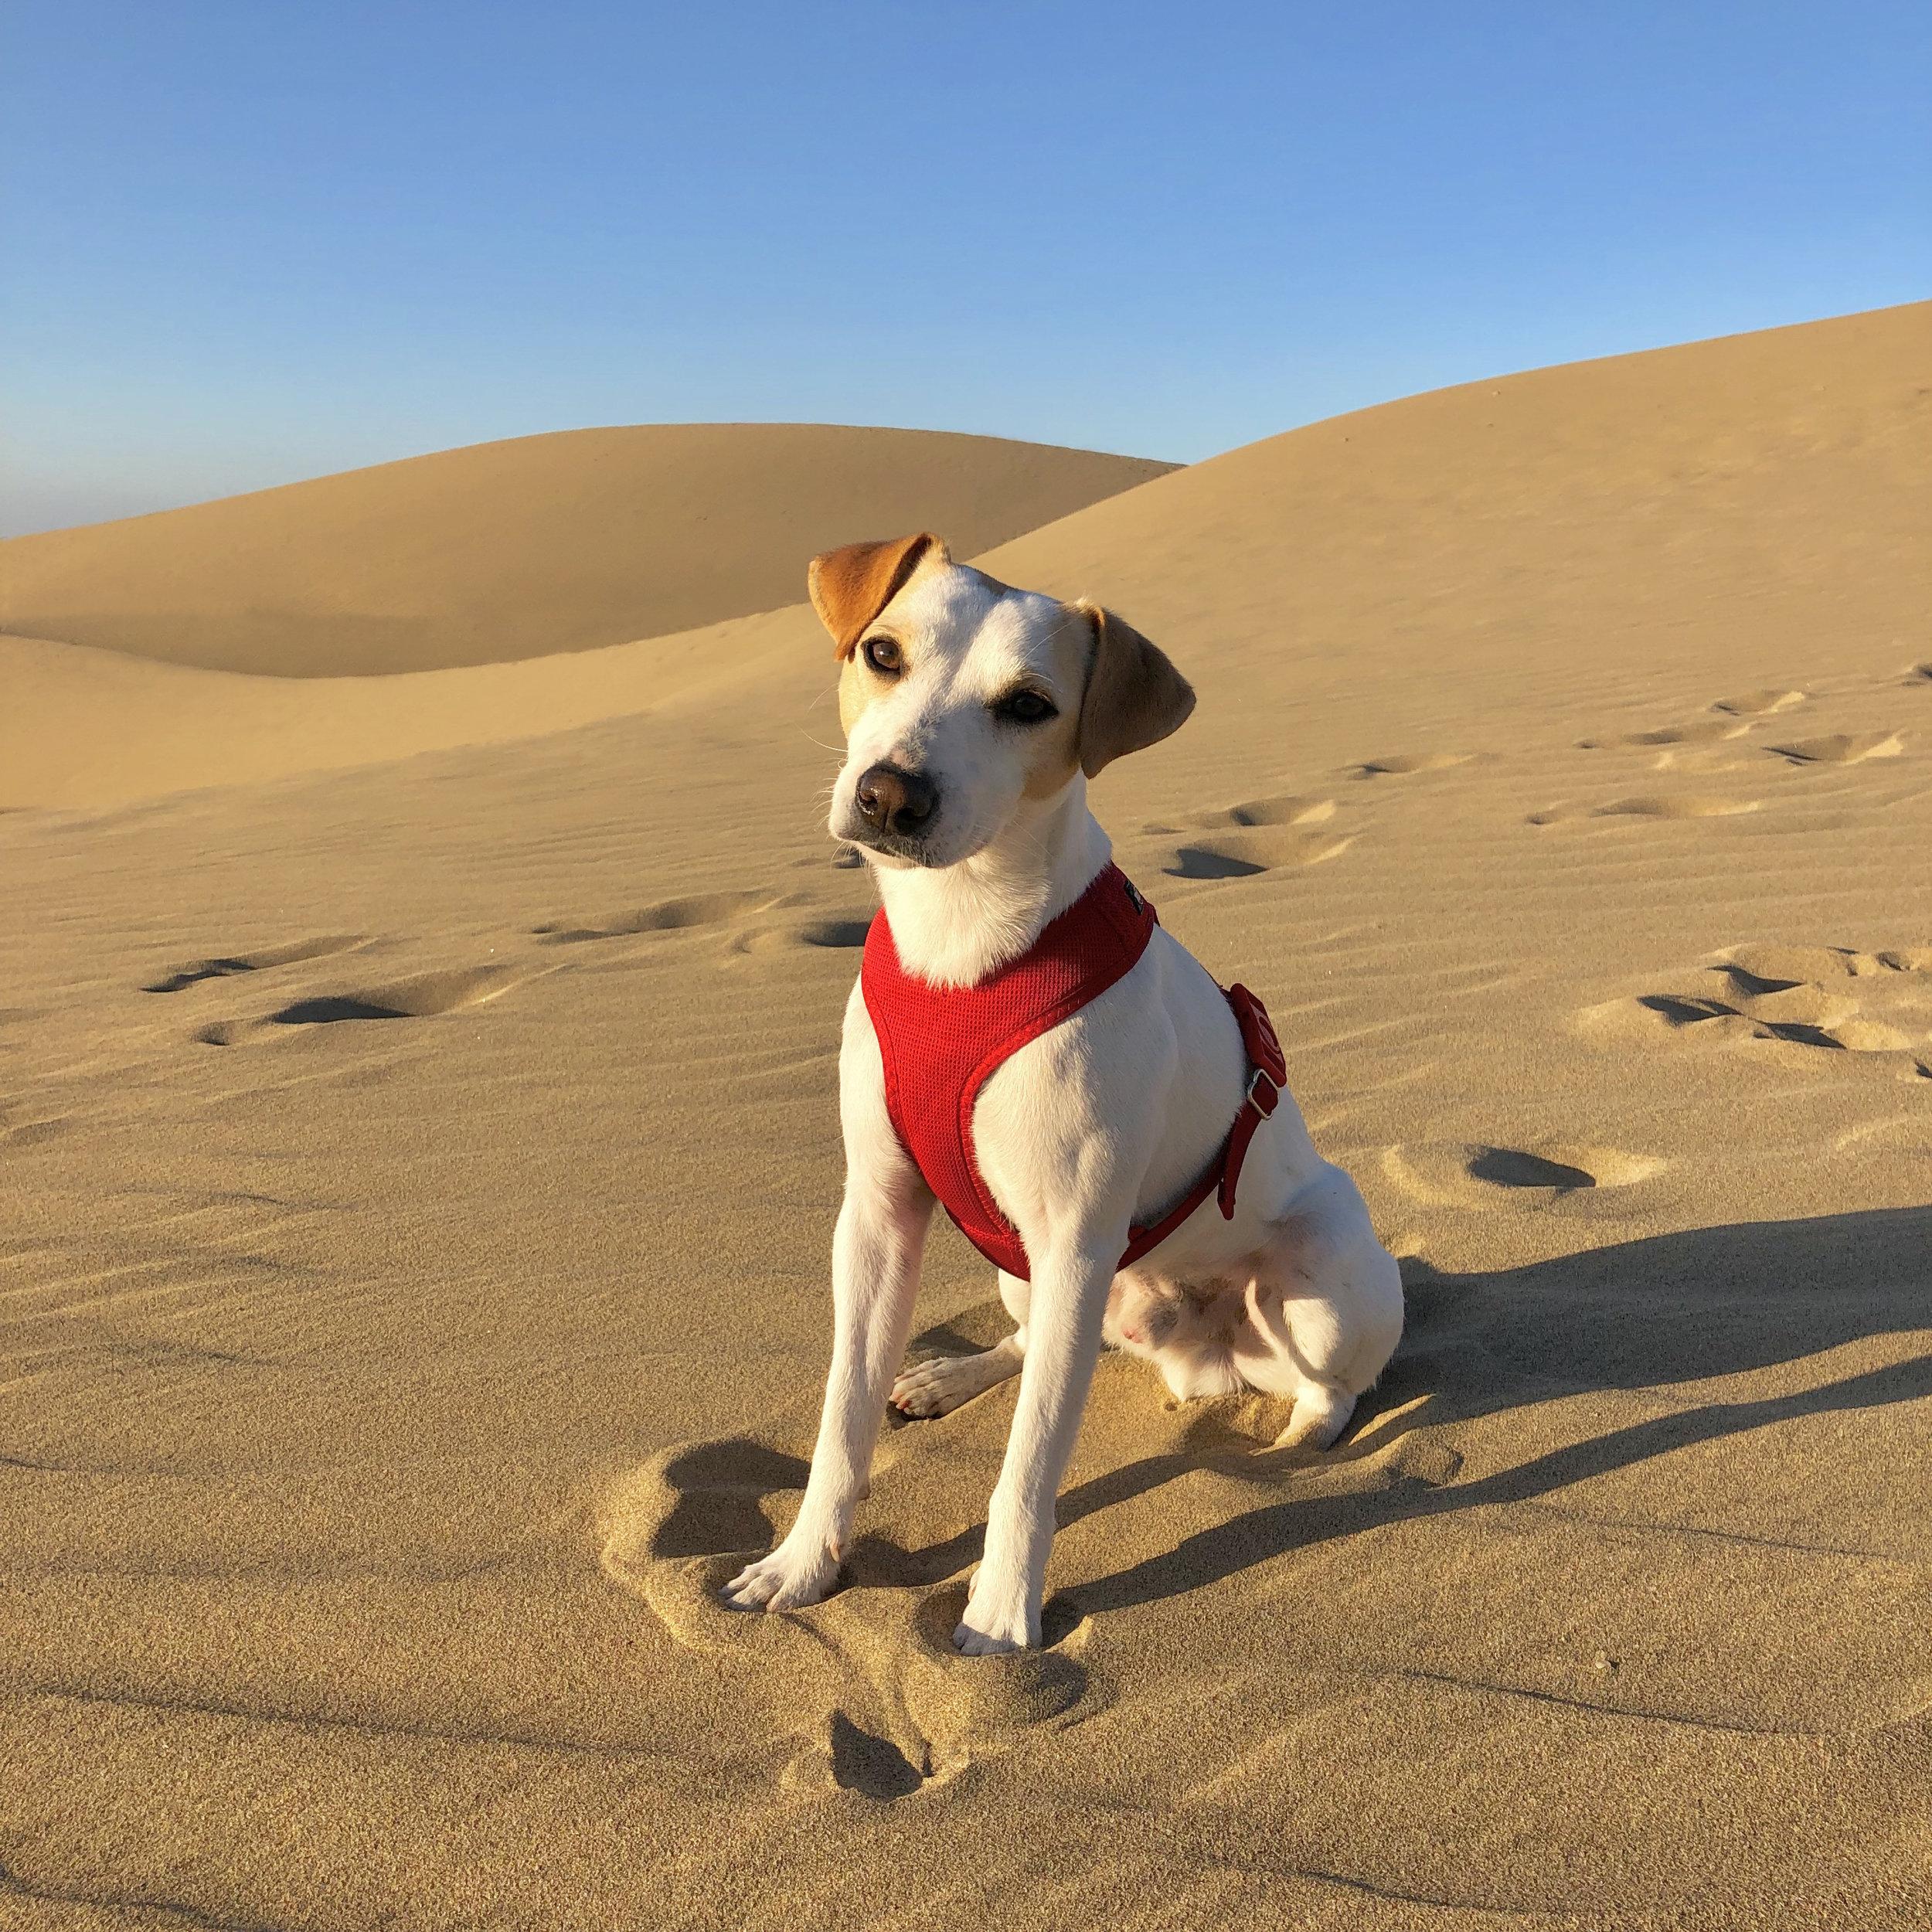 In the dunes of Maspalomas.